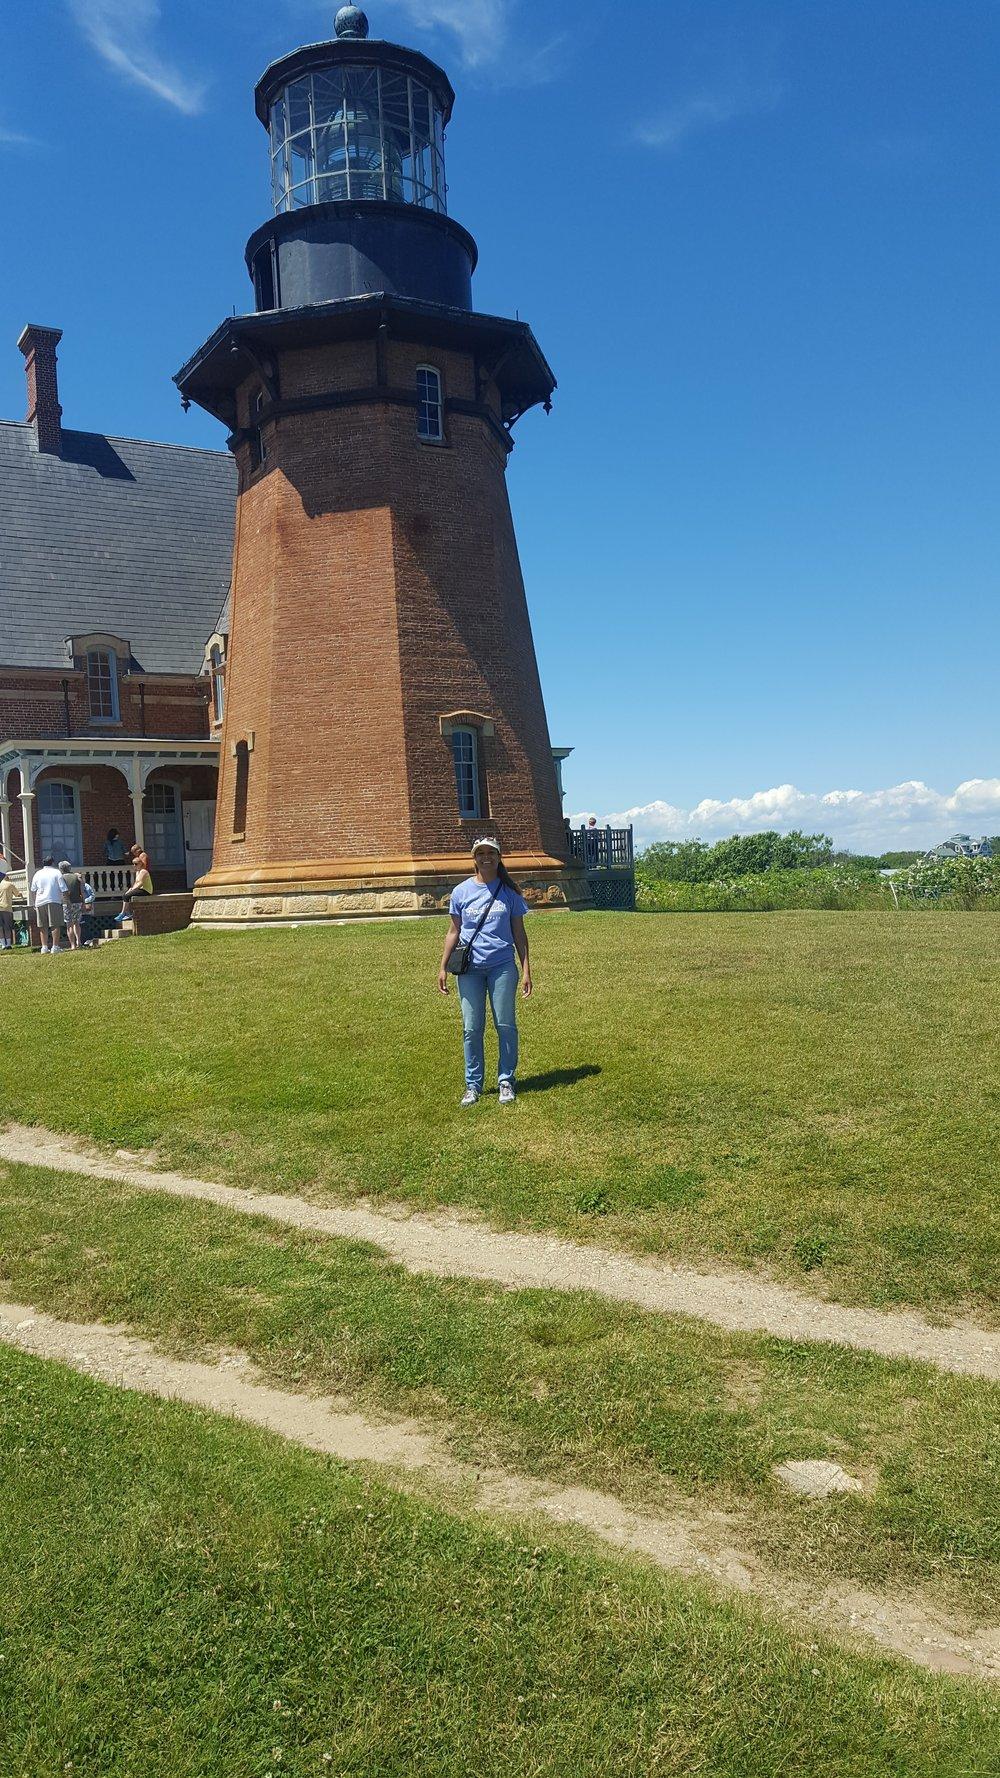 Tourist at the Southeast Lighthouse on Block Island, RI